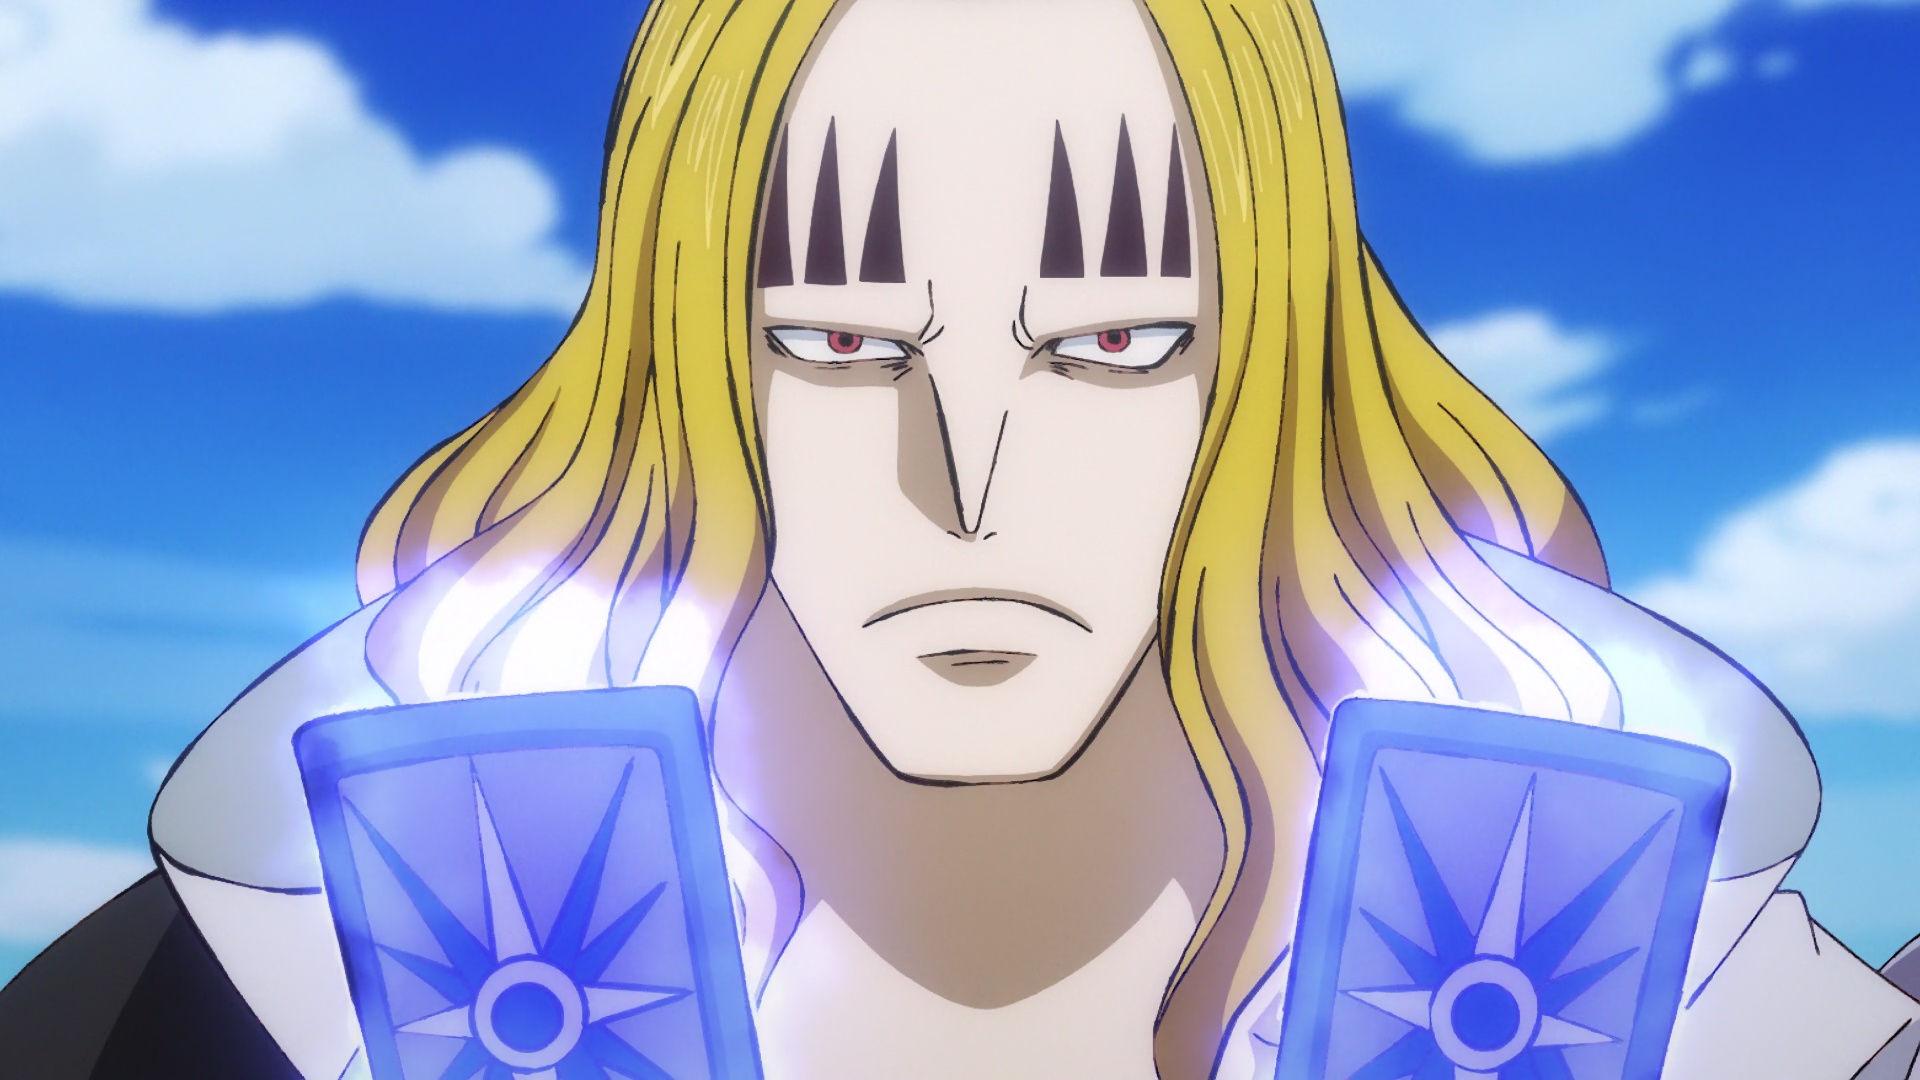 One Piece 898 VOSTFR SD/HD/HD 10BITS/FHD News background